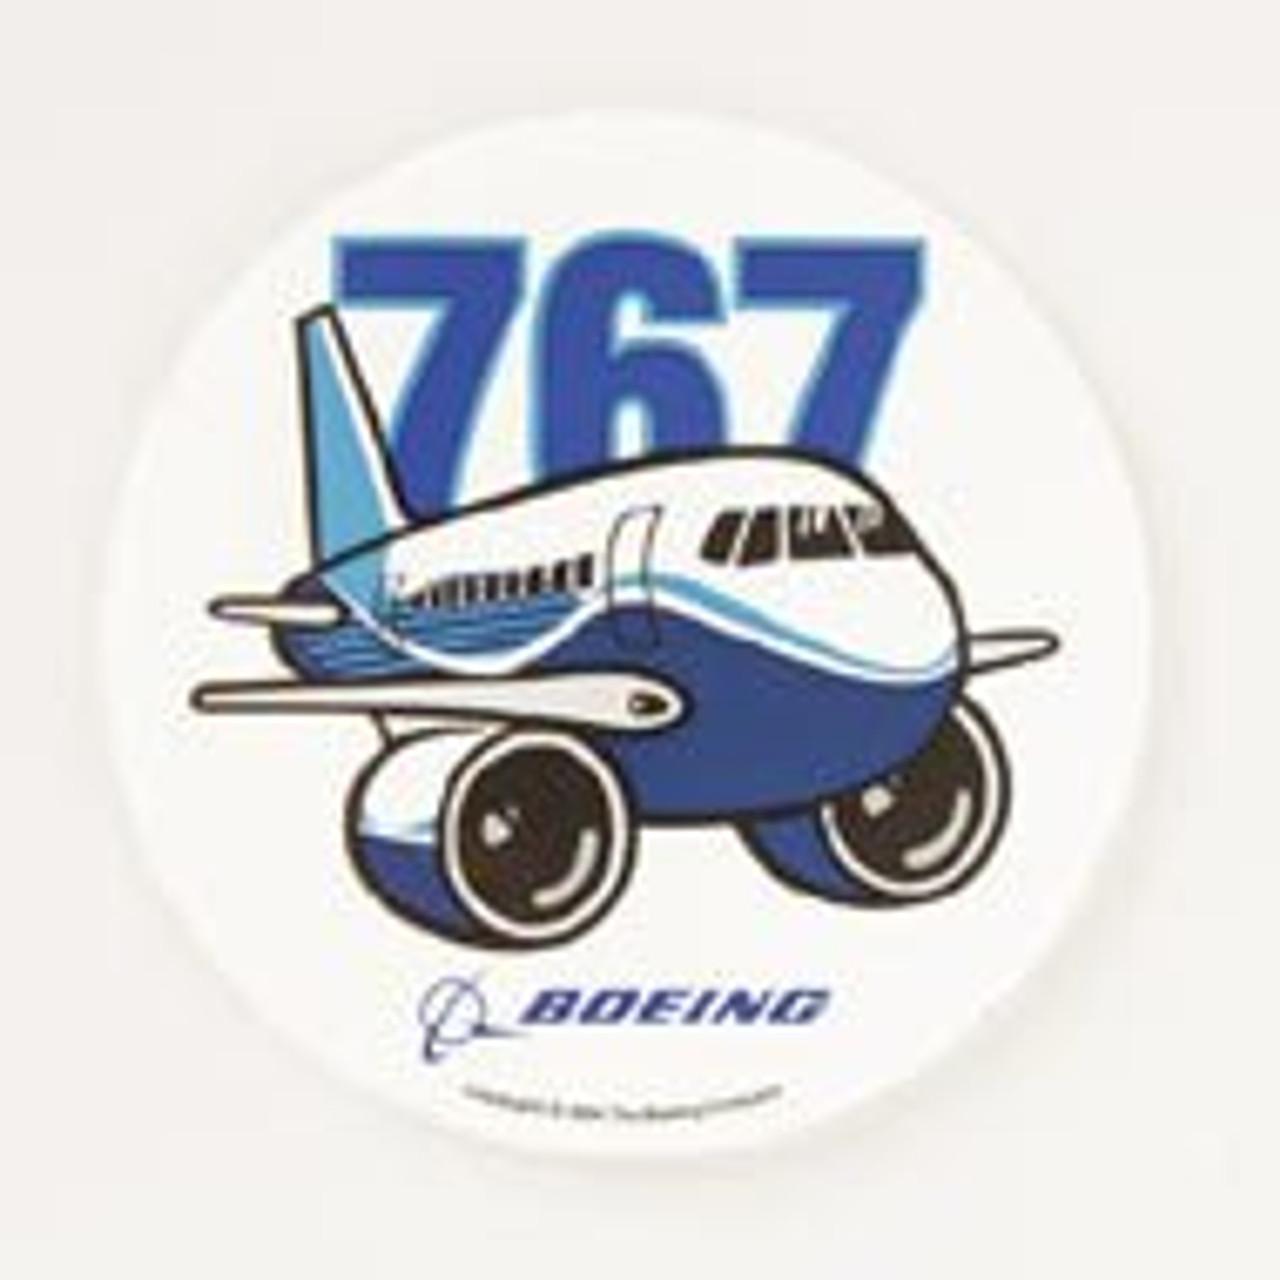 767 Pudgy Sticker